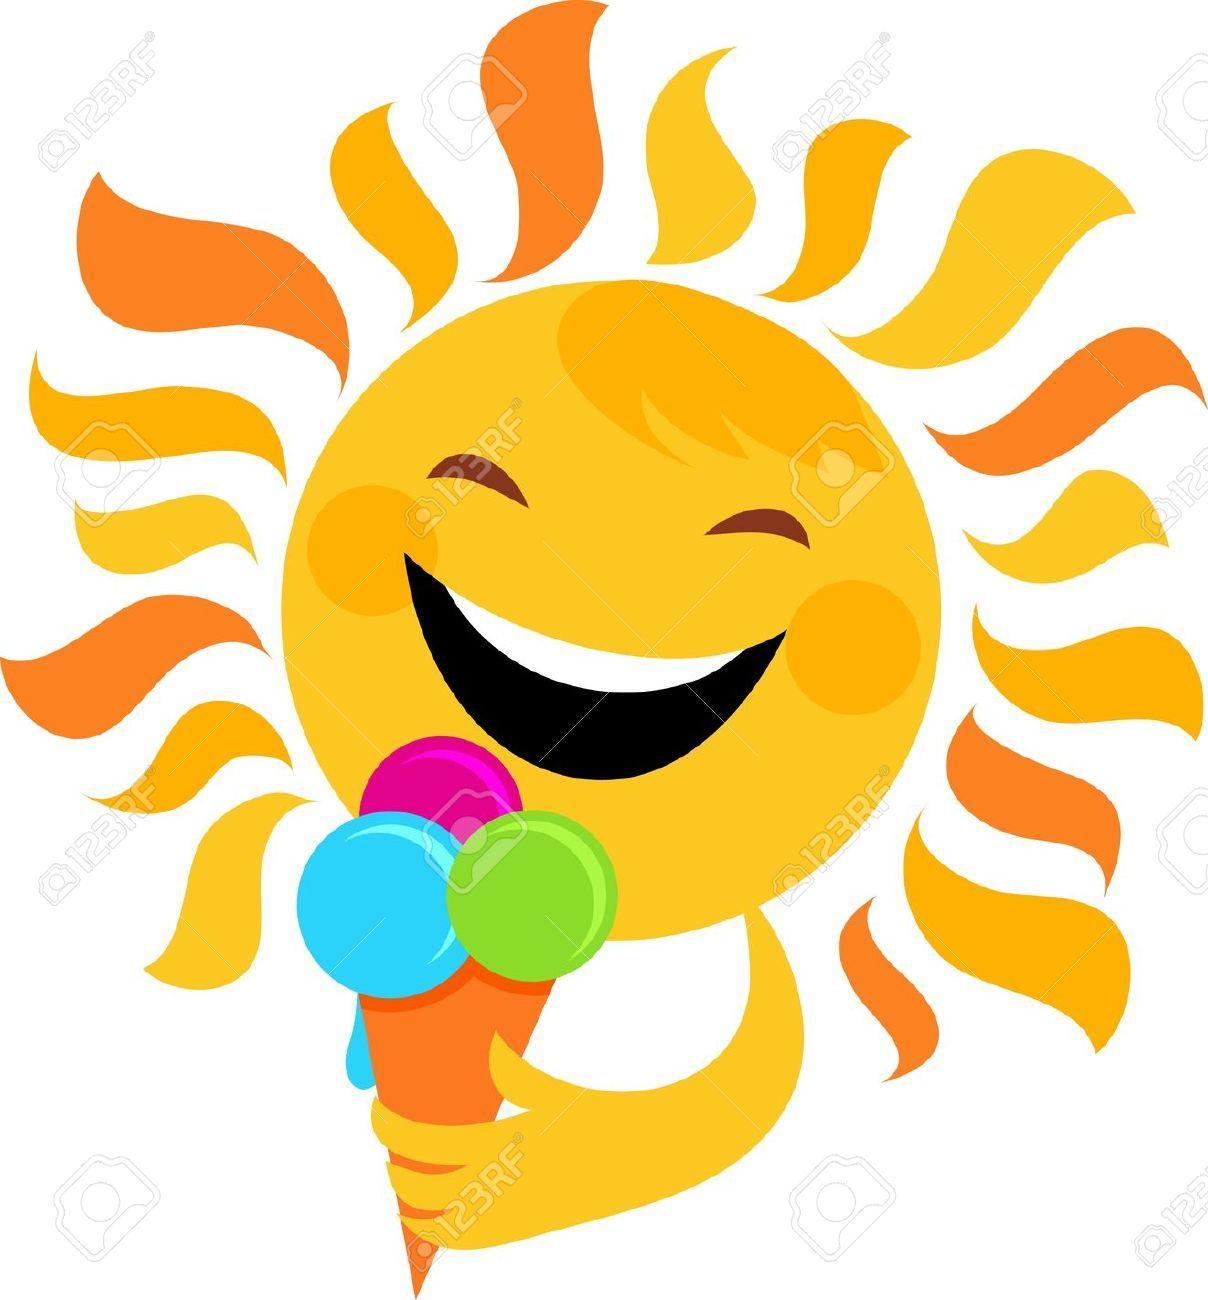 Sunshine and ice cream clipart jpg Pin by Joyce Matzen on August | Sun painting, Sun art, Sun jpg